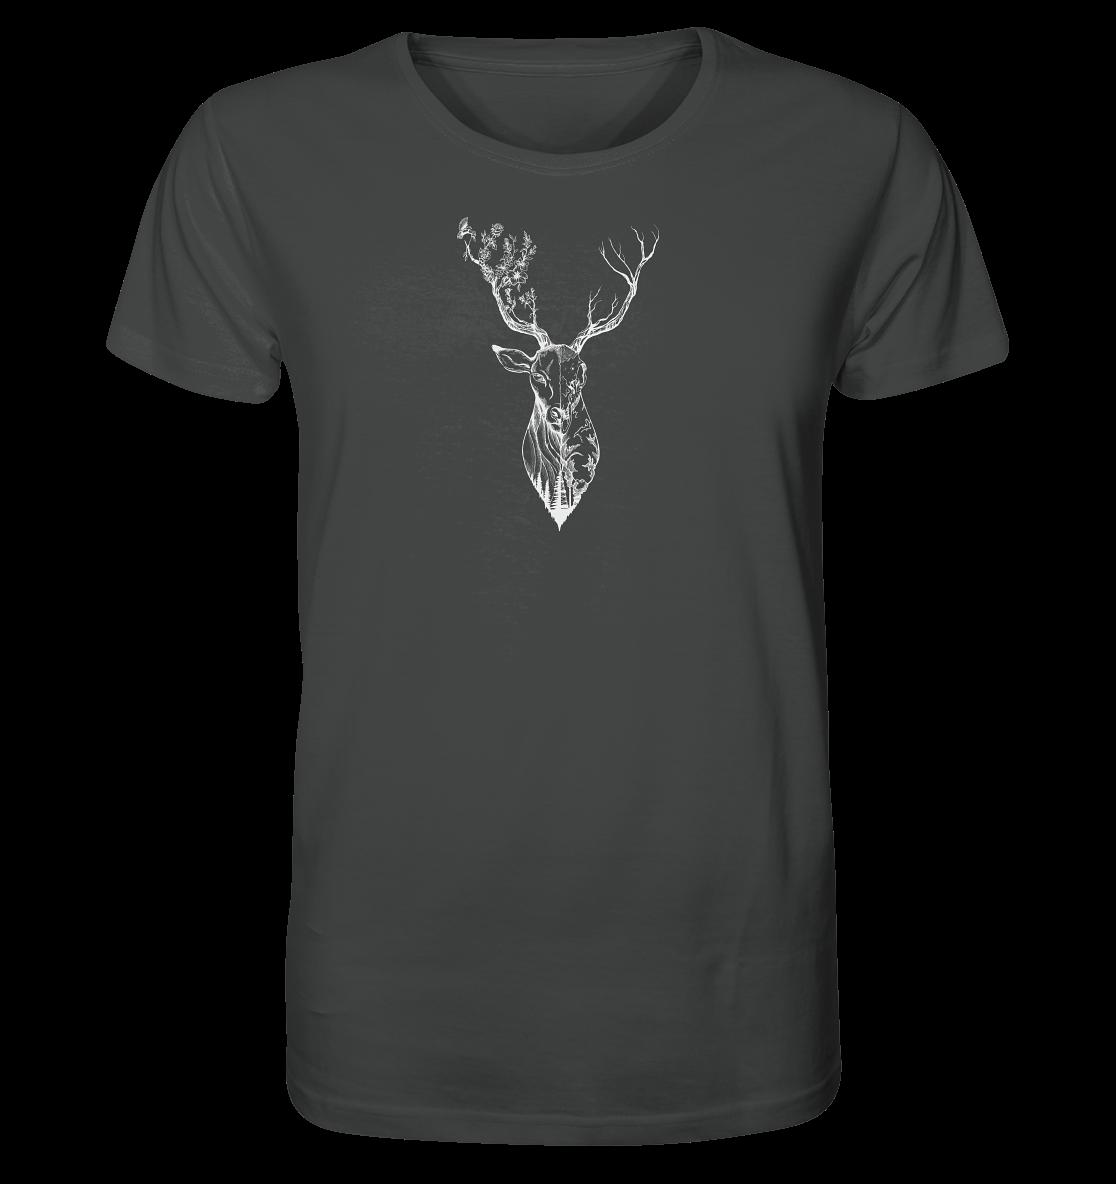 front-organic-shirt-444545-1116x-7.png